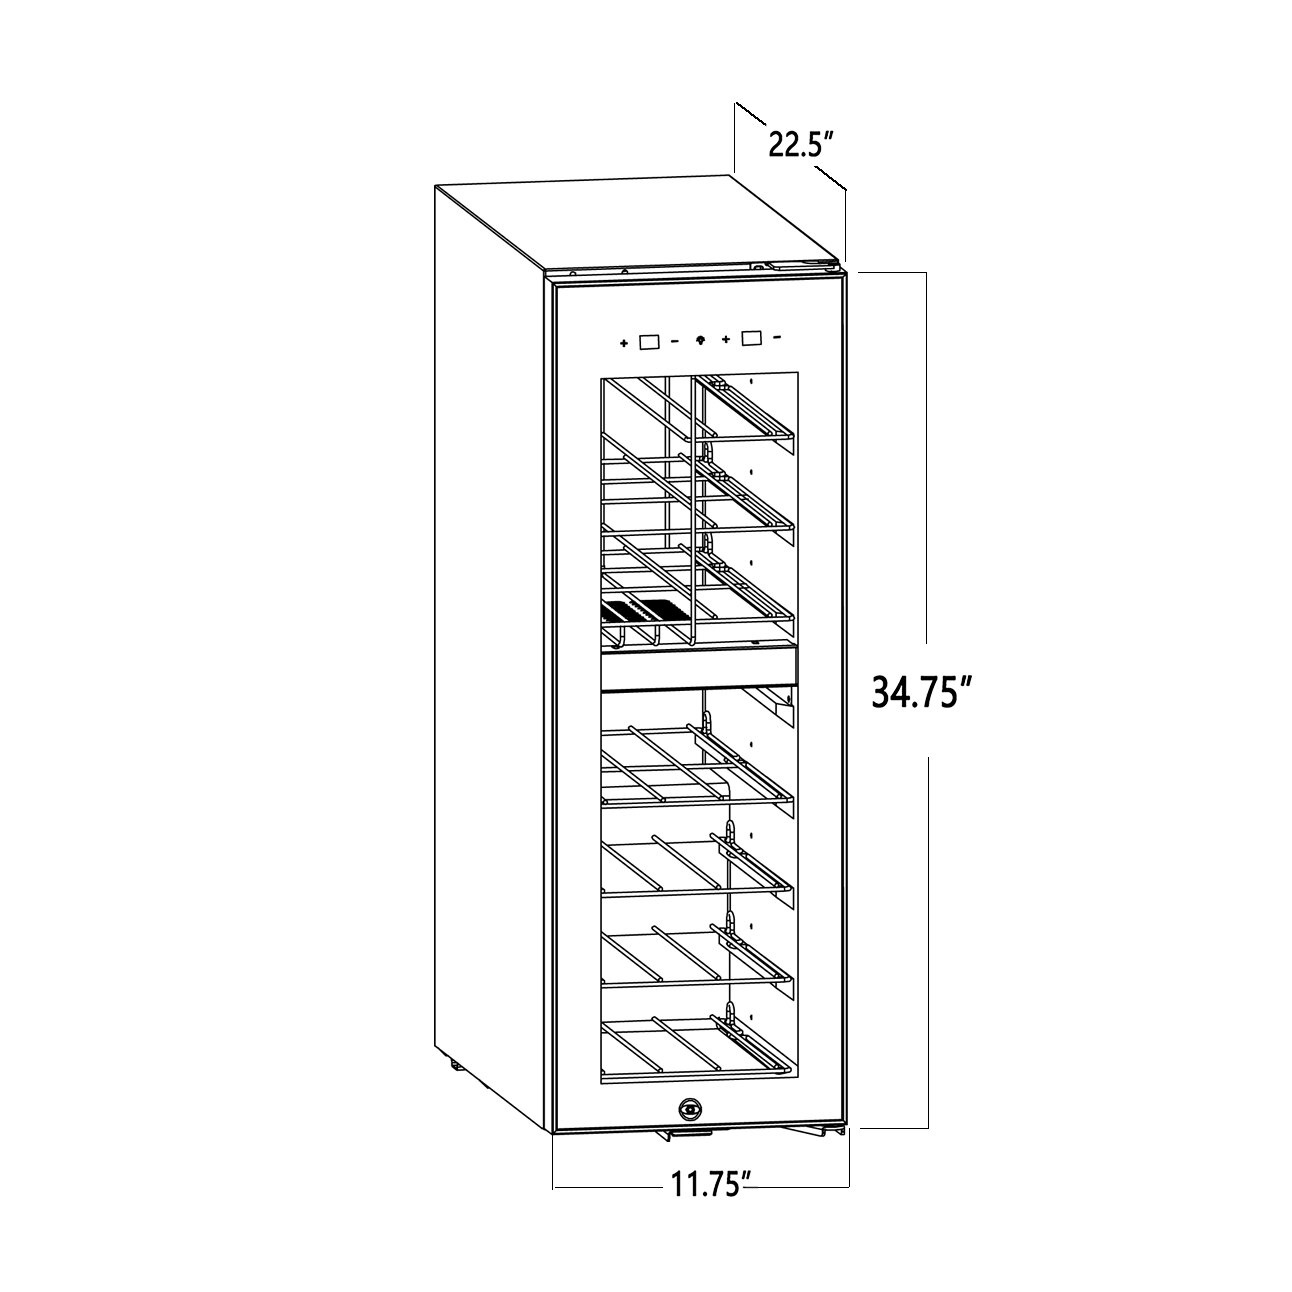 hight resolution of  avanti wiring diagram on sincgars radio configurations diagrams electronic circuit diagrams engine diagrams